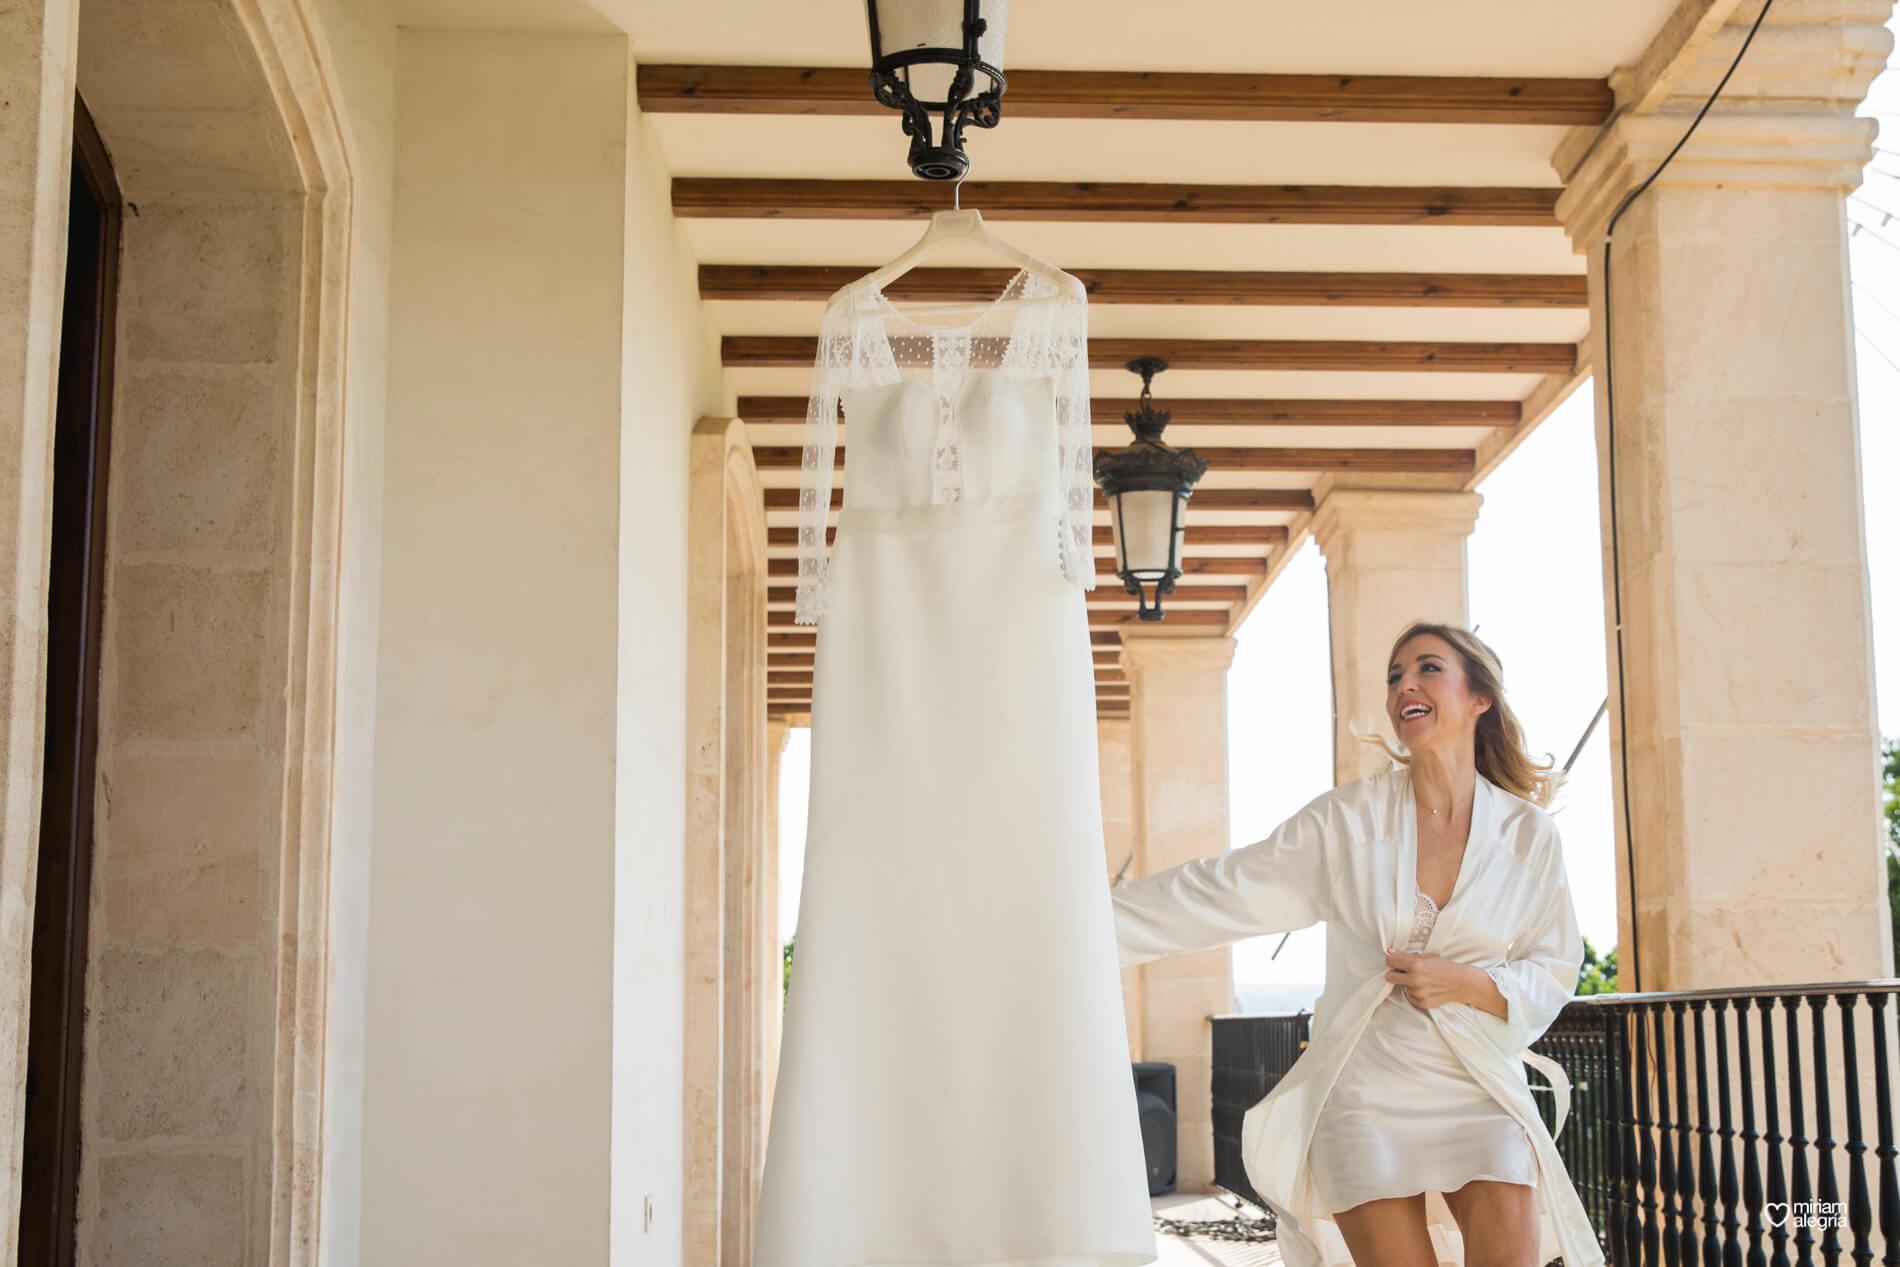 la-boda-de-alemc7-miriam-alegria-fotografos-boda-murcia-8